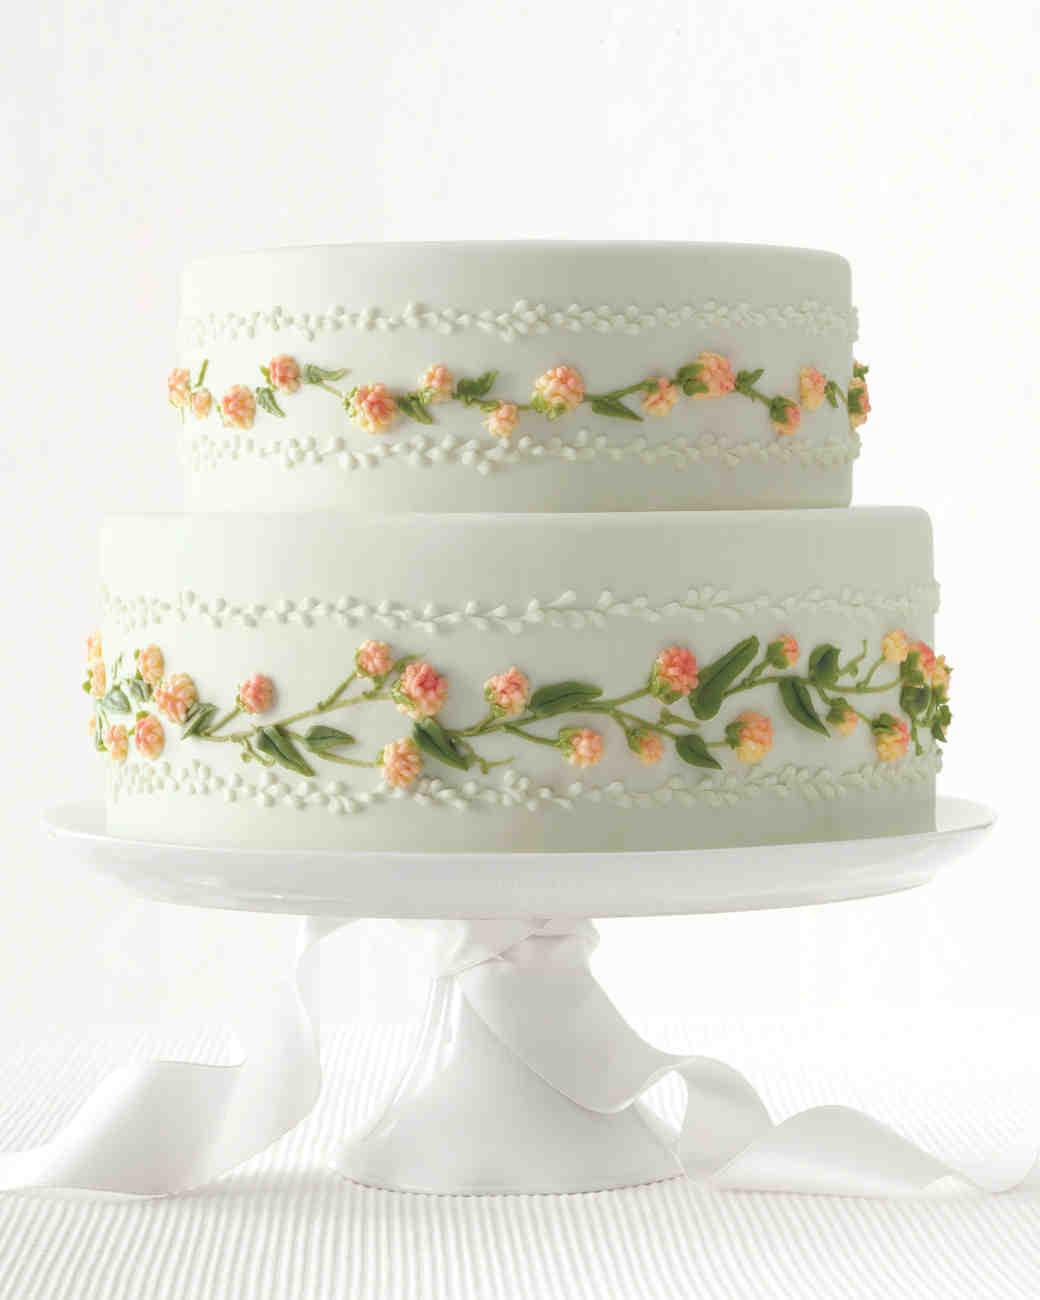 Almond Wedding Cake Recipe Martha Stewart  New Takes on Traditional Wedding Cake Flavors